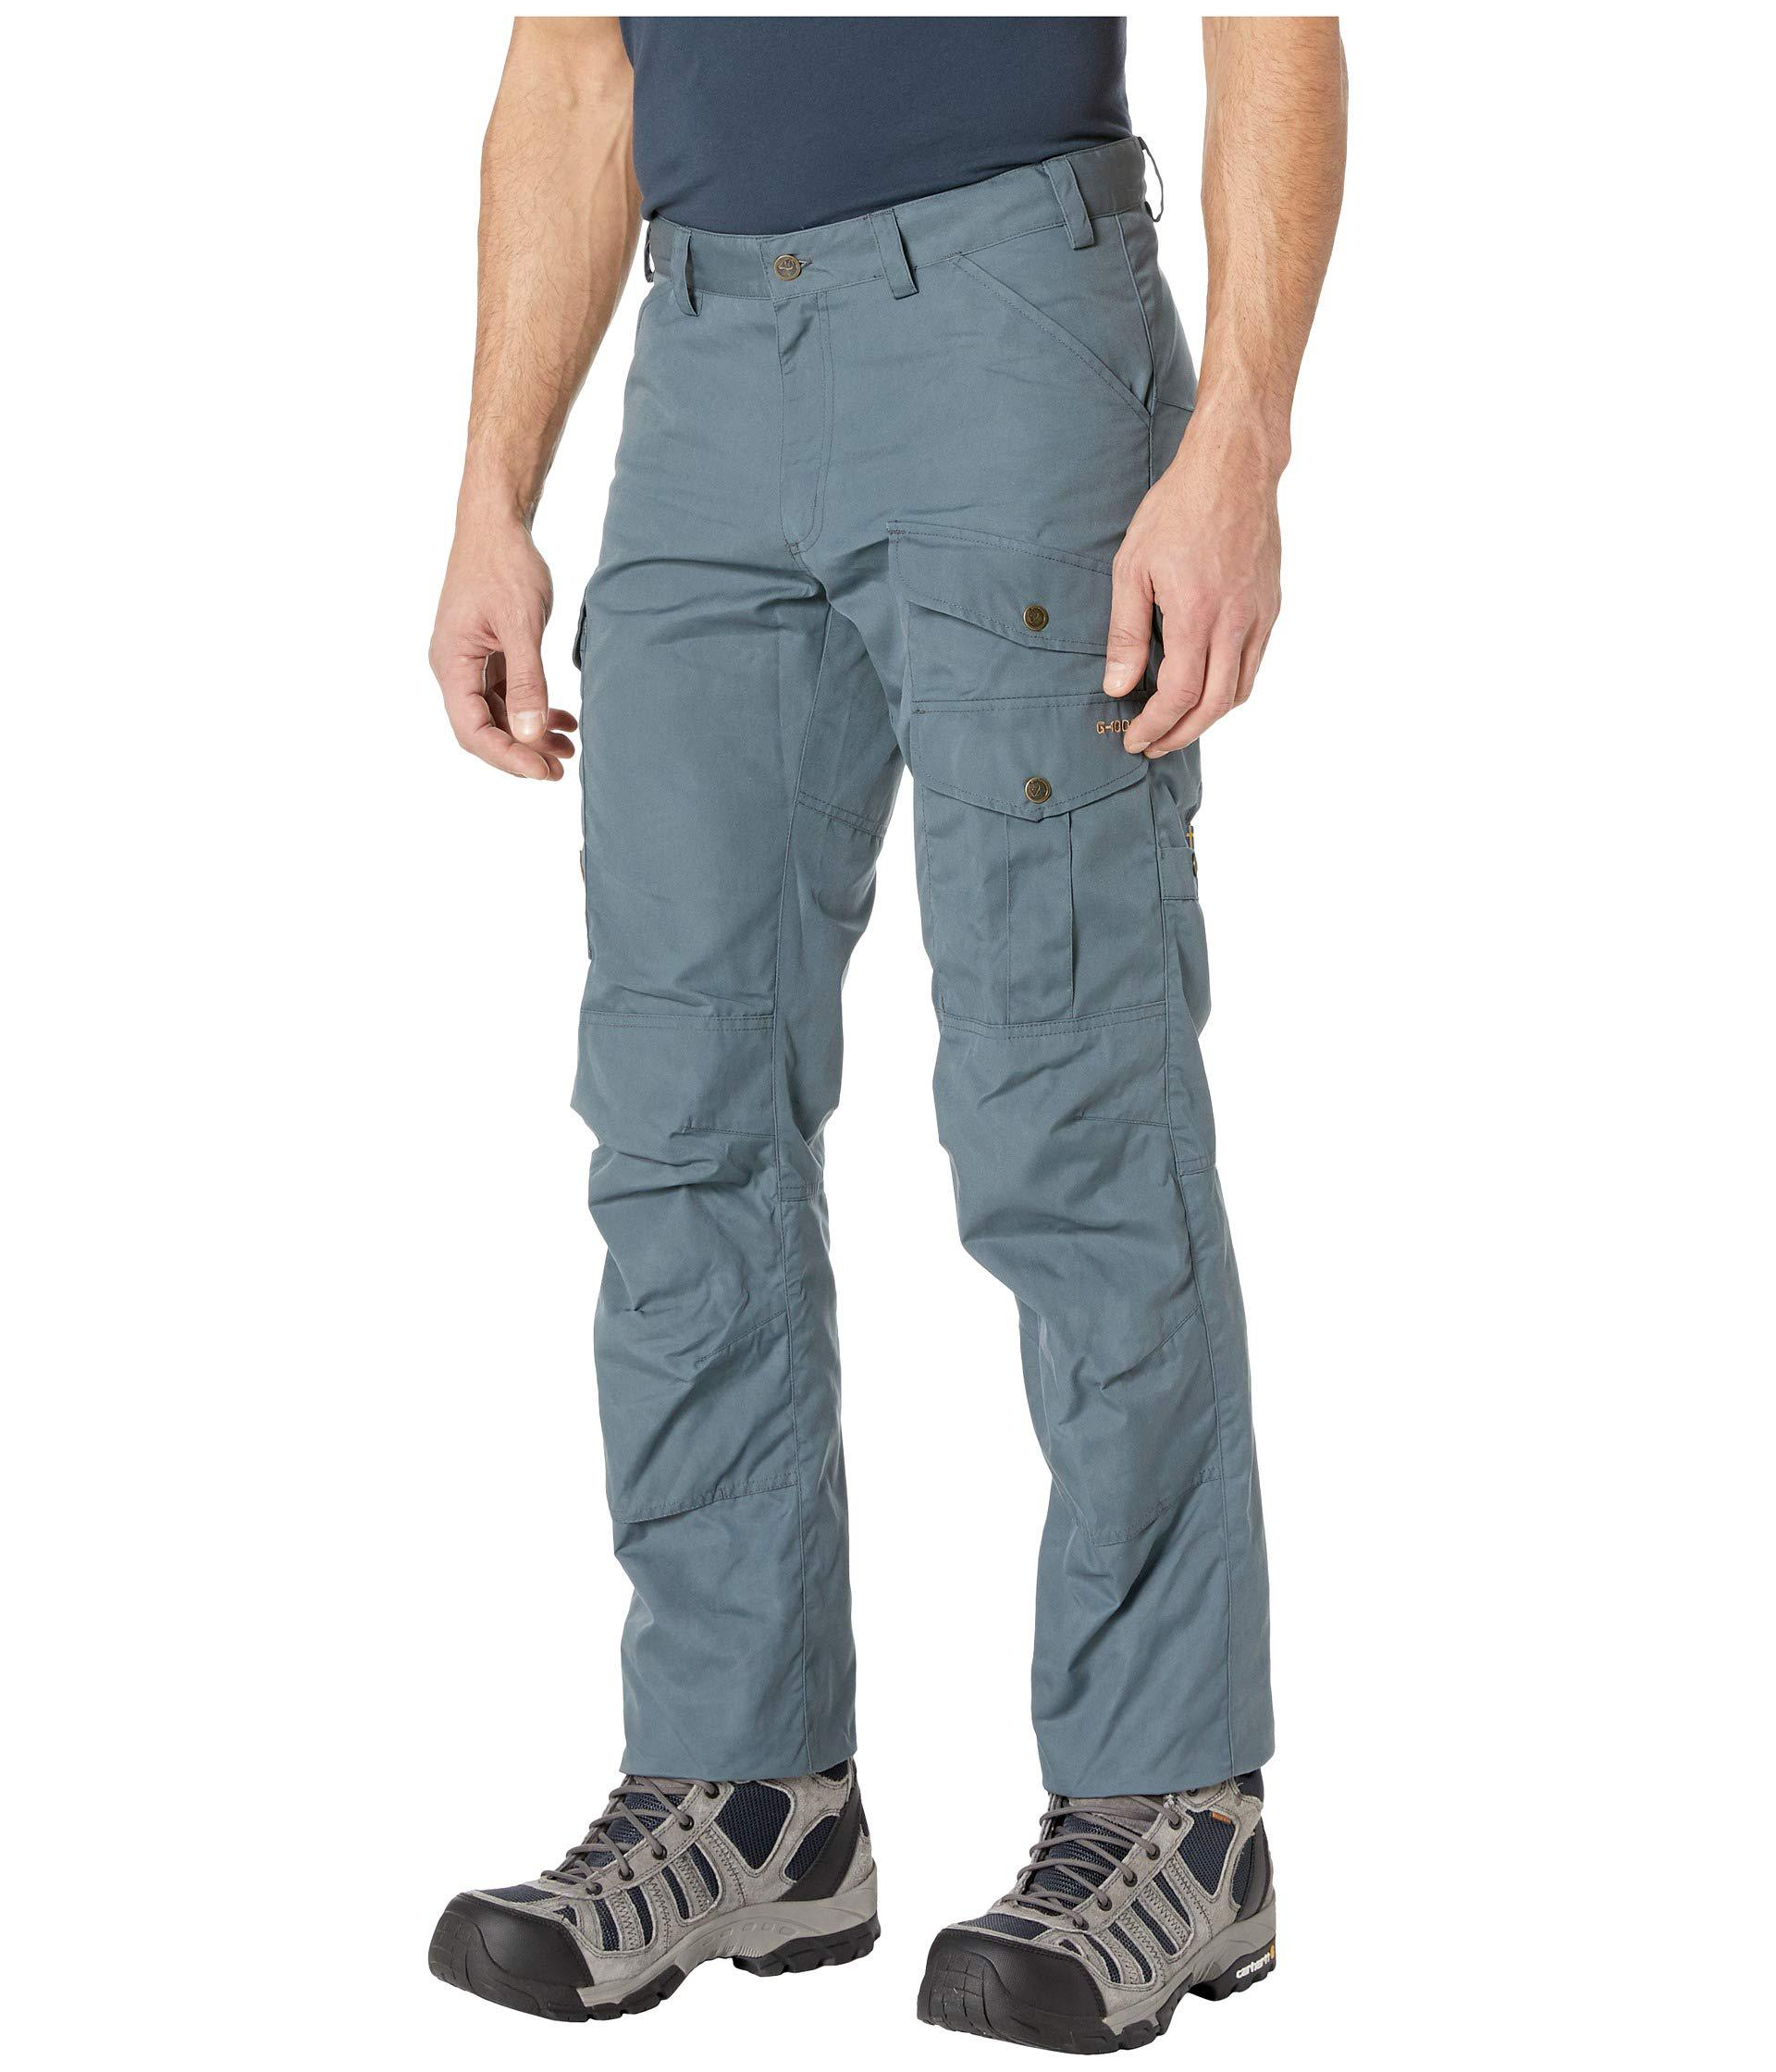 100% echt offizieller Verkauf Top Marken Barents Pro Trousers (black/black) Men's Casual Pants